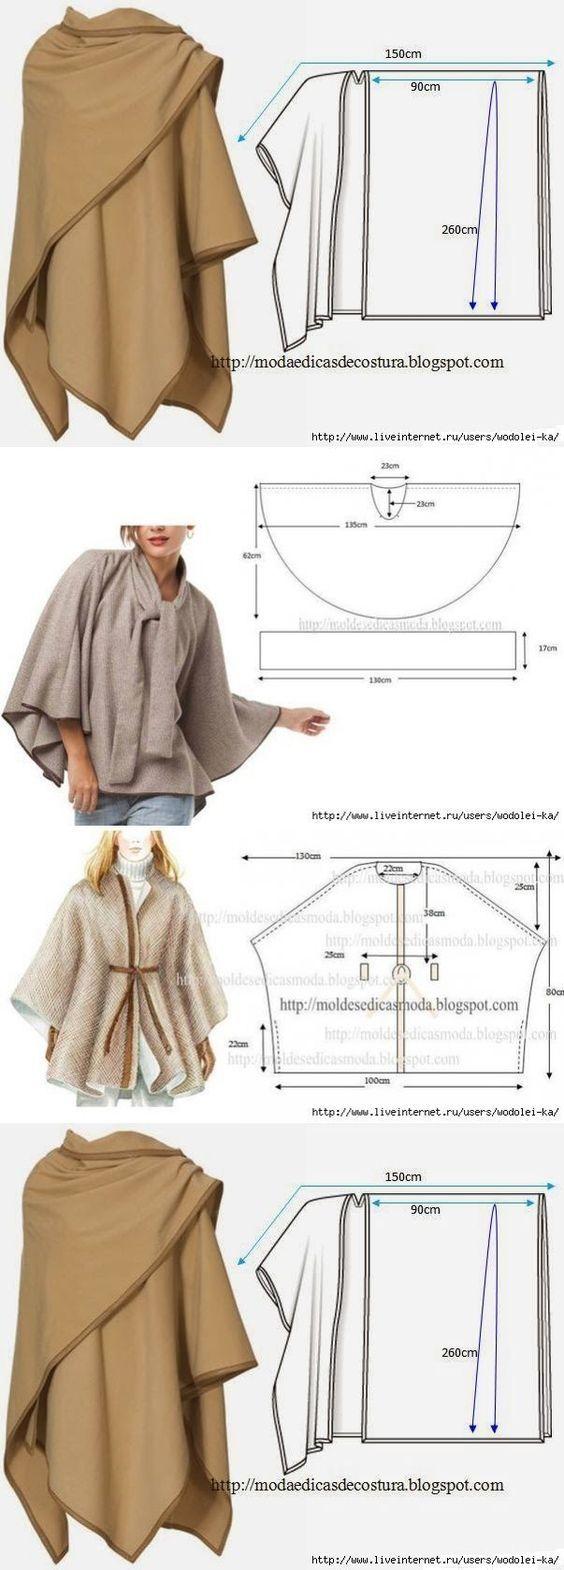 Hooded wrap coat pdf sewing patterns free pattern and sewing 20 free patterns for cardigans and sweaters jeuxipadfo Choice Image